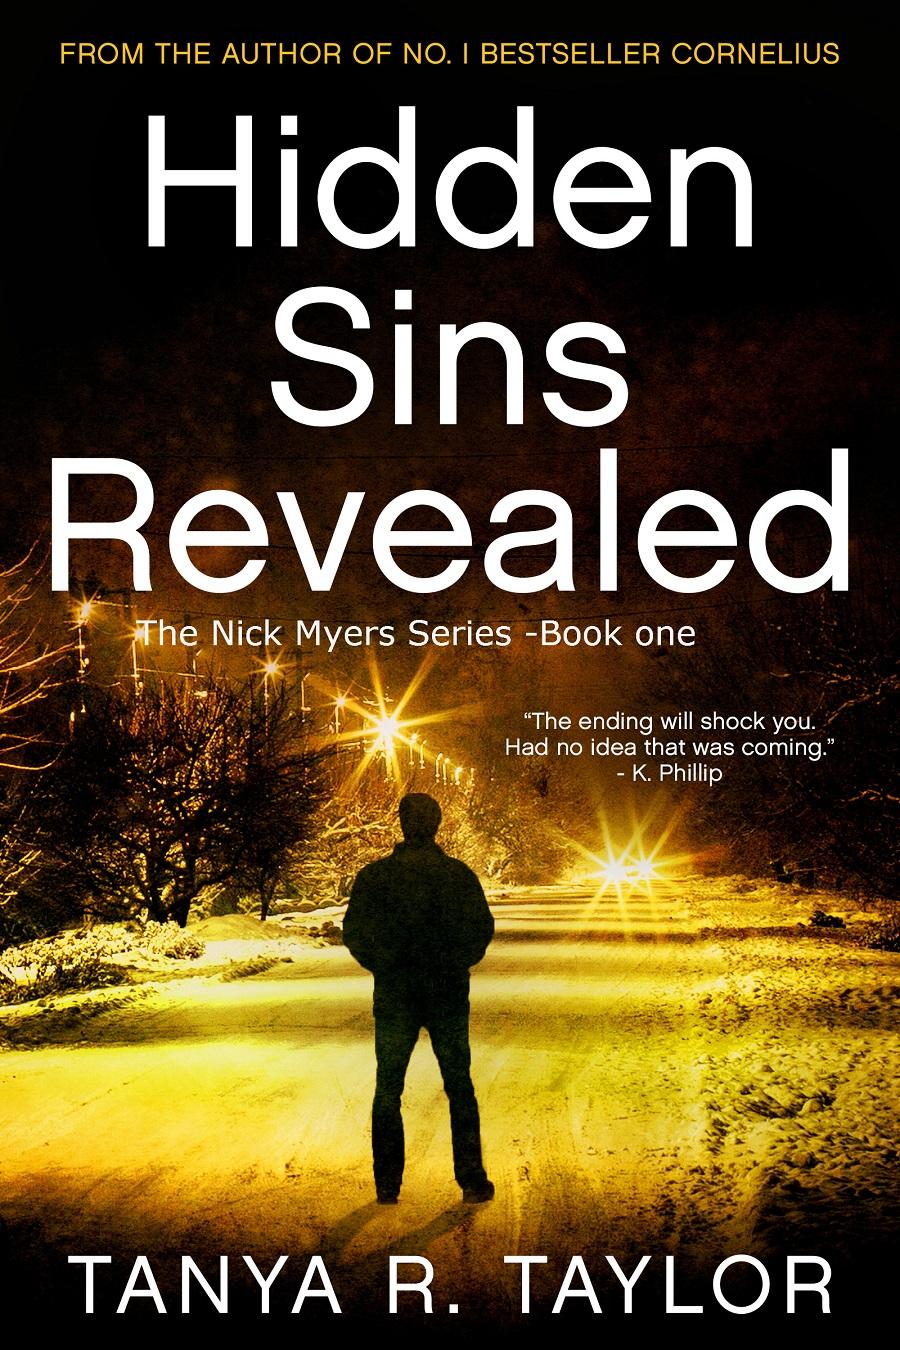 HIDDEN SINS REVEALED EBOOK NICK MYERS SERIES BOOK ONE (smaller)